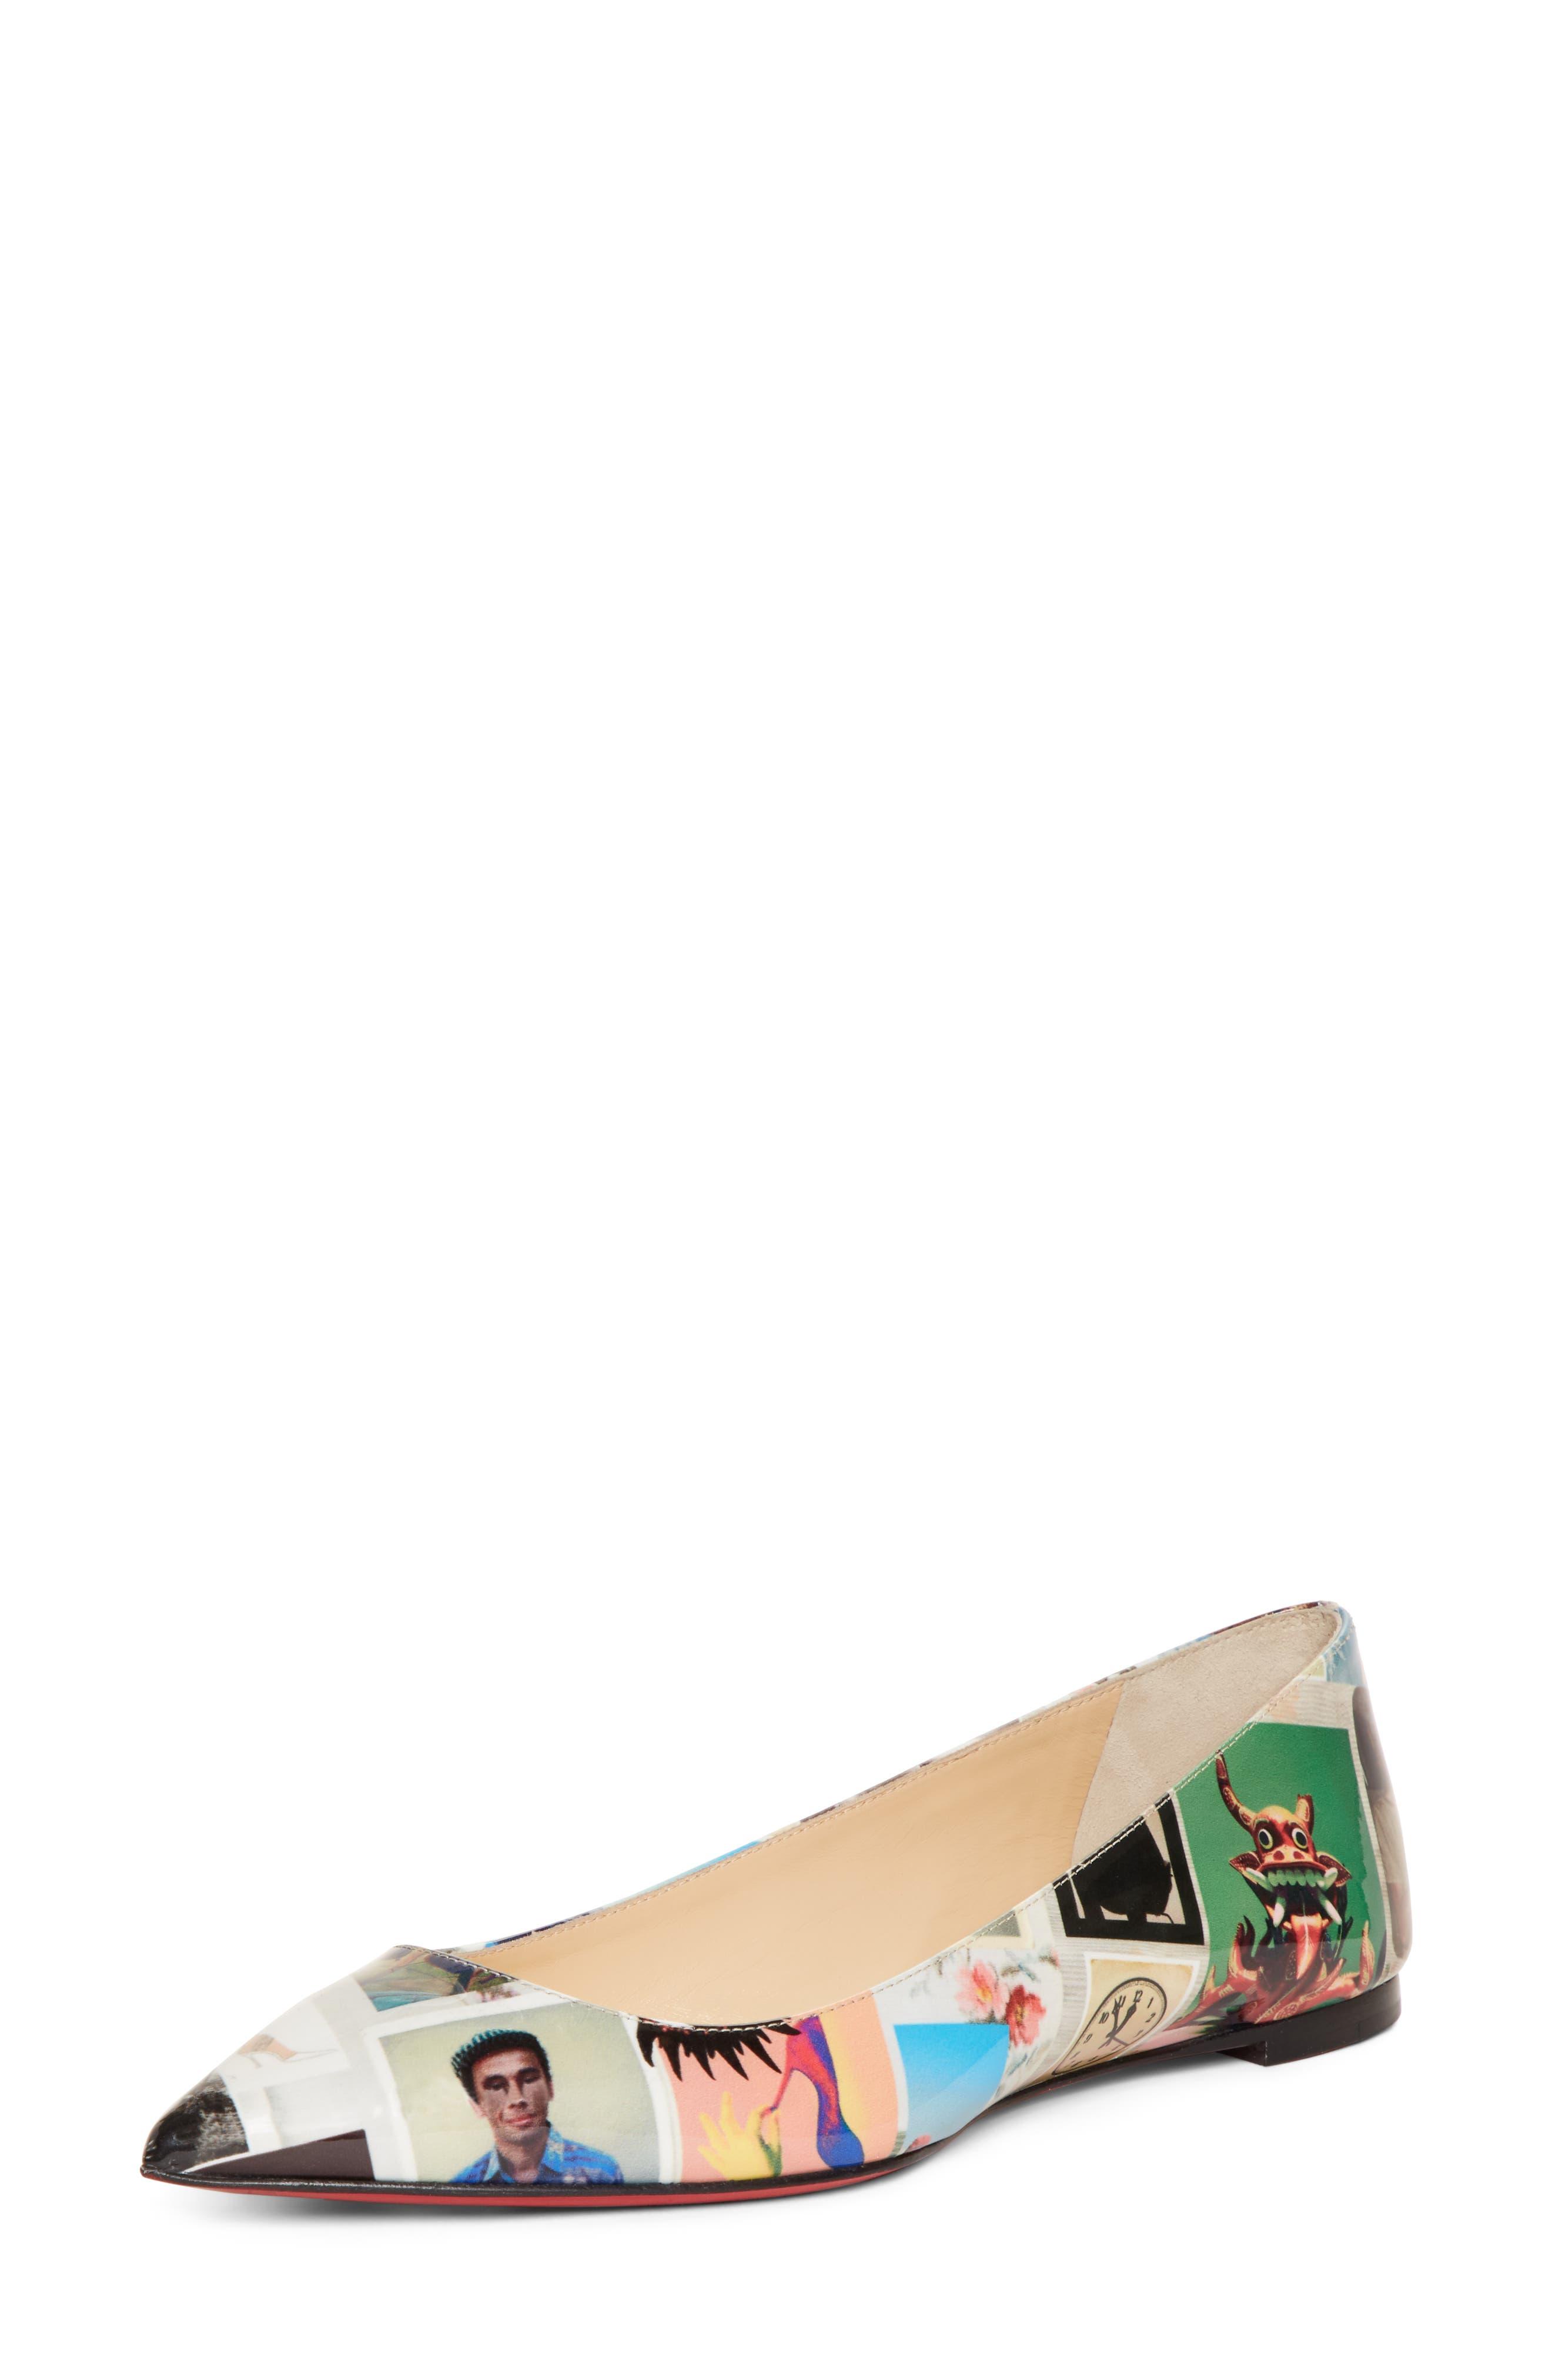 Christian Louboutin Ballalla Collage Pointy Toe Flat - Black